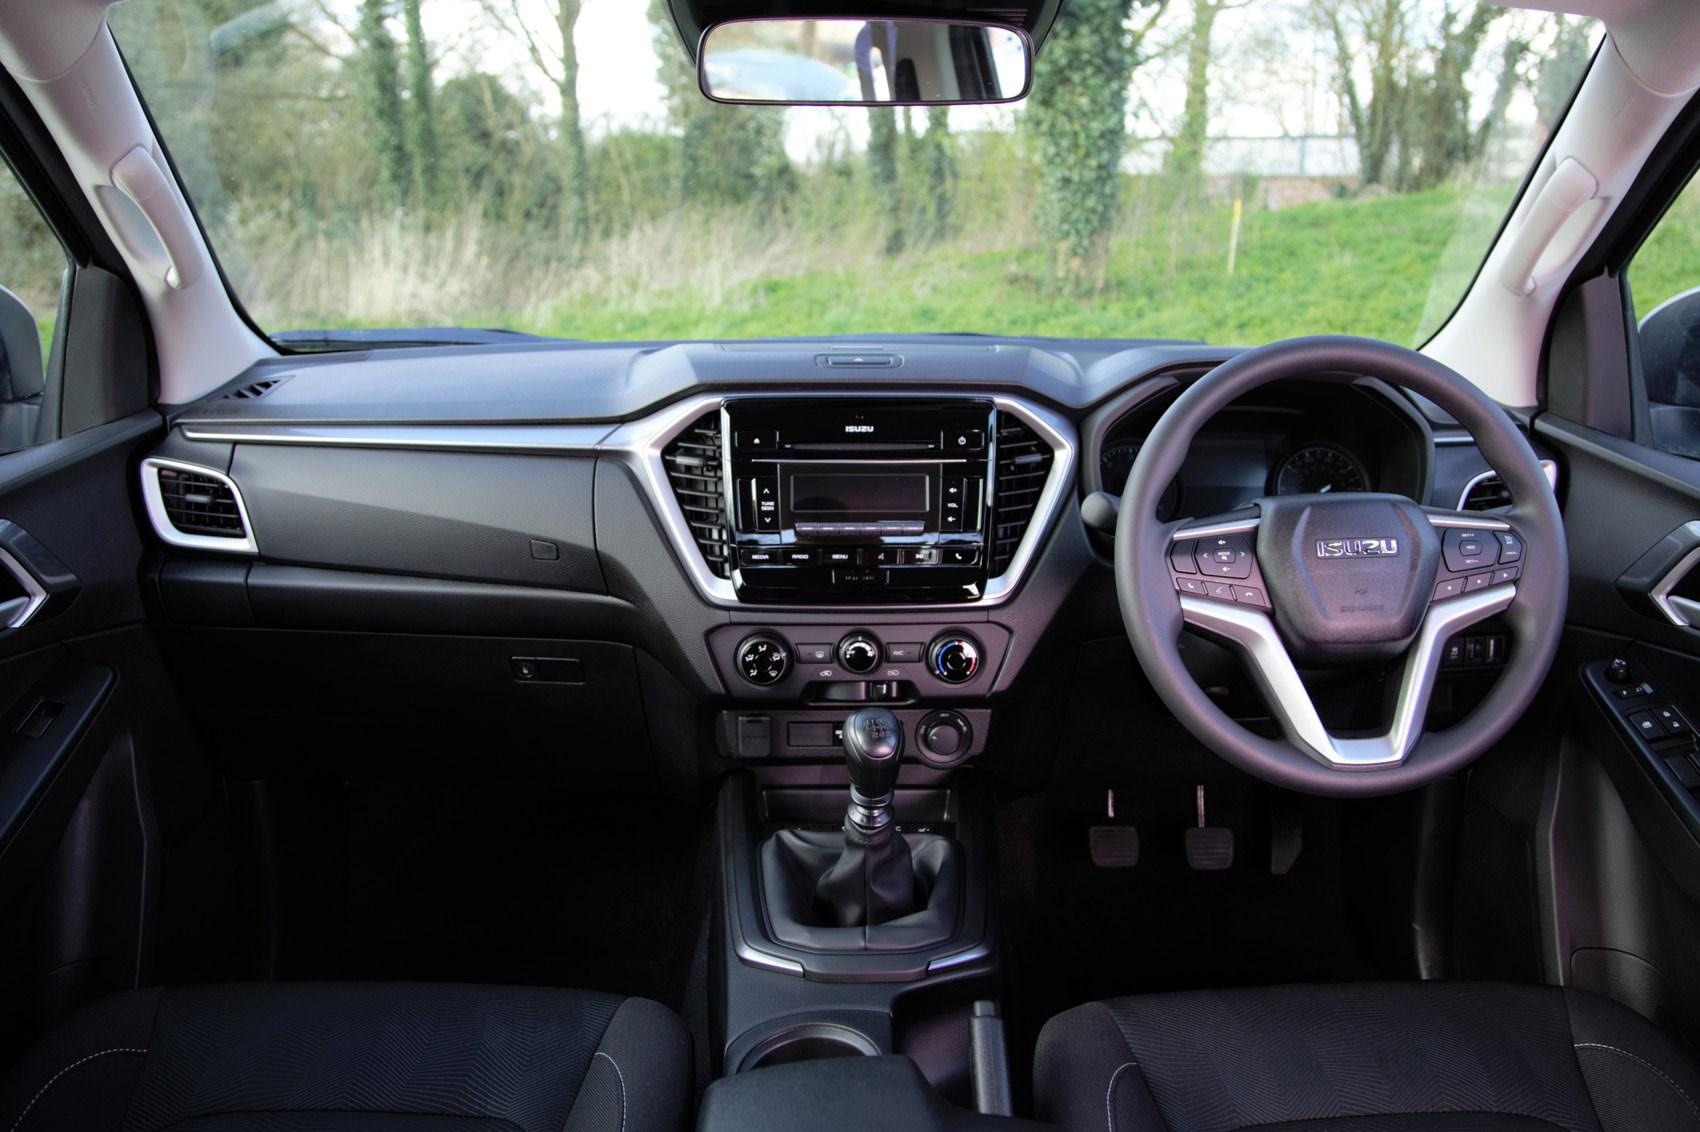 Isuzu D-Max review, 2021, DL20 cab interior